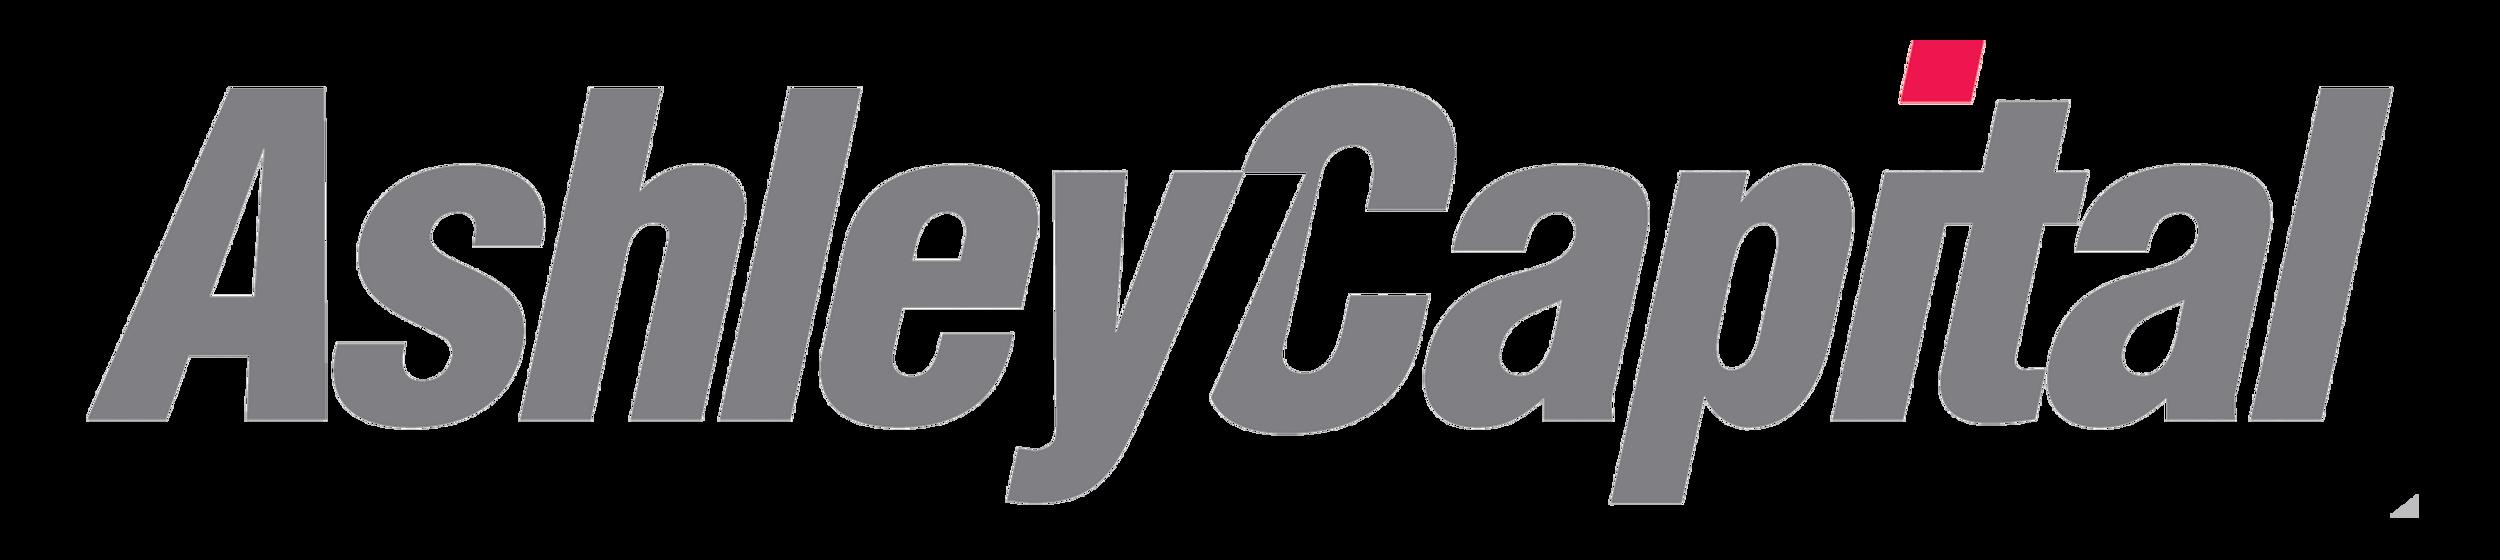 Ashley Capital Logo.png